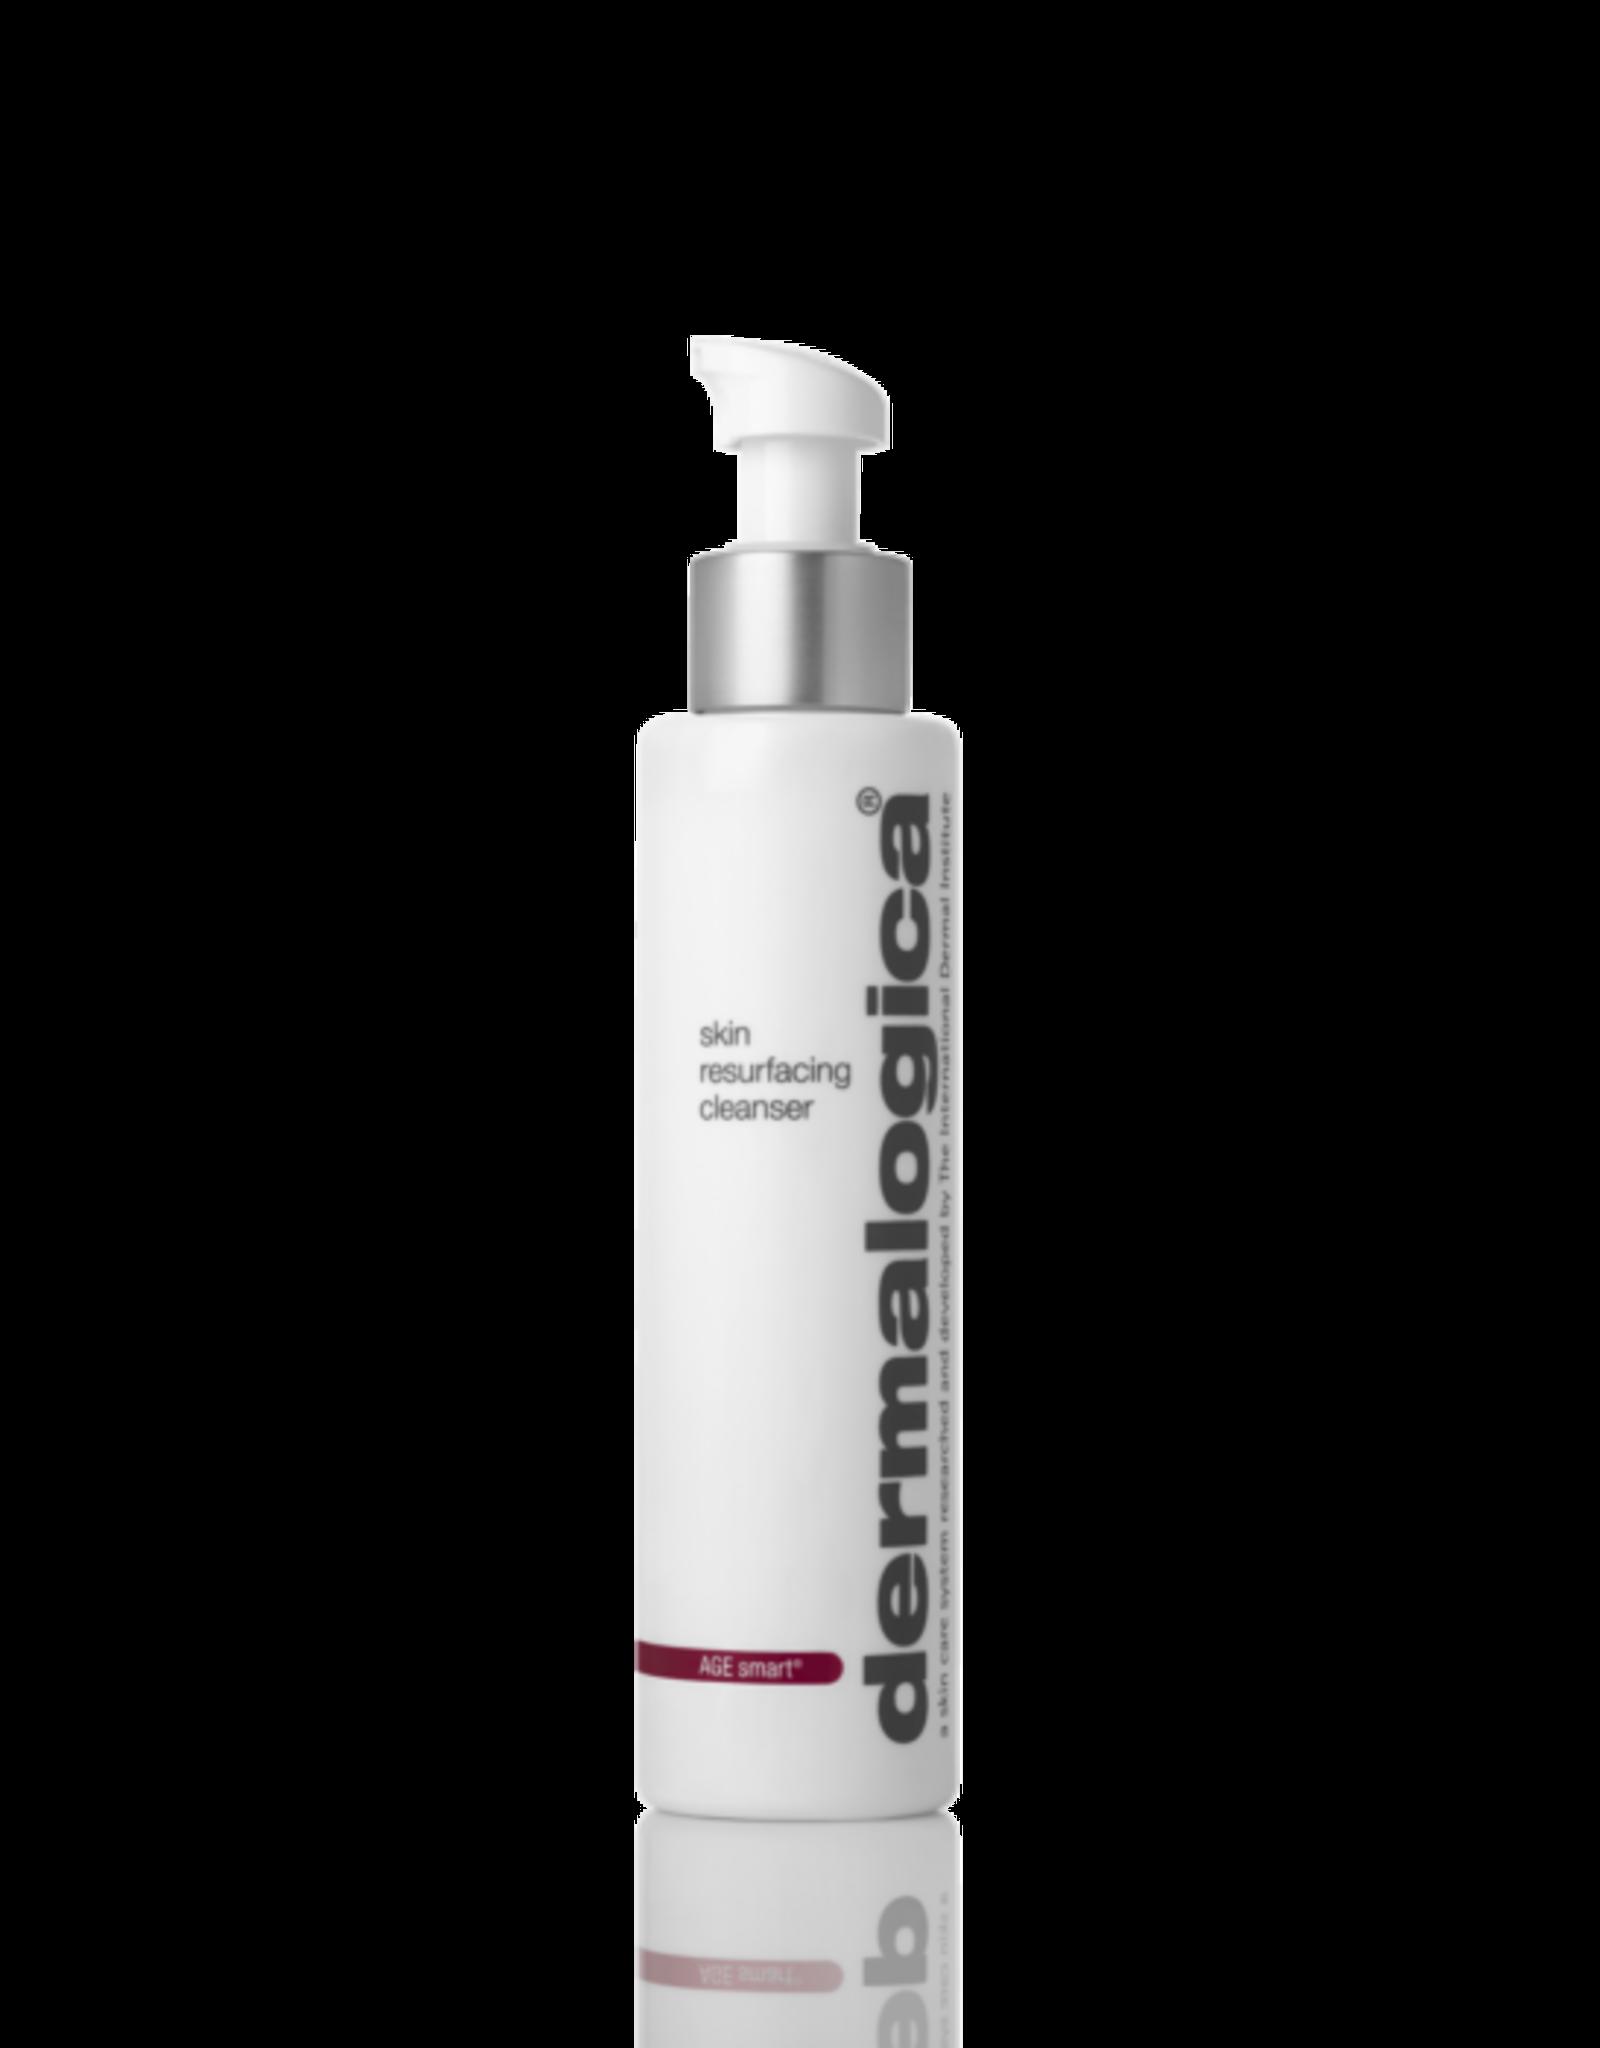 Dermalogica AGE Smart Skin Resurfacing Cleanser 150ml - Dermalogica